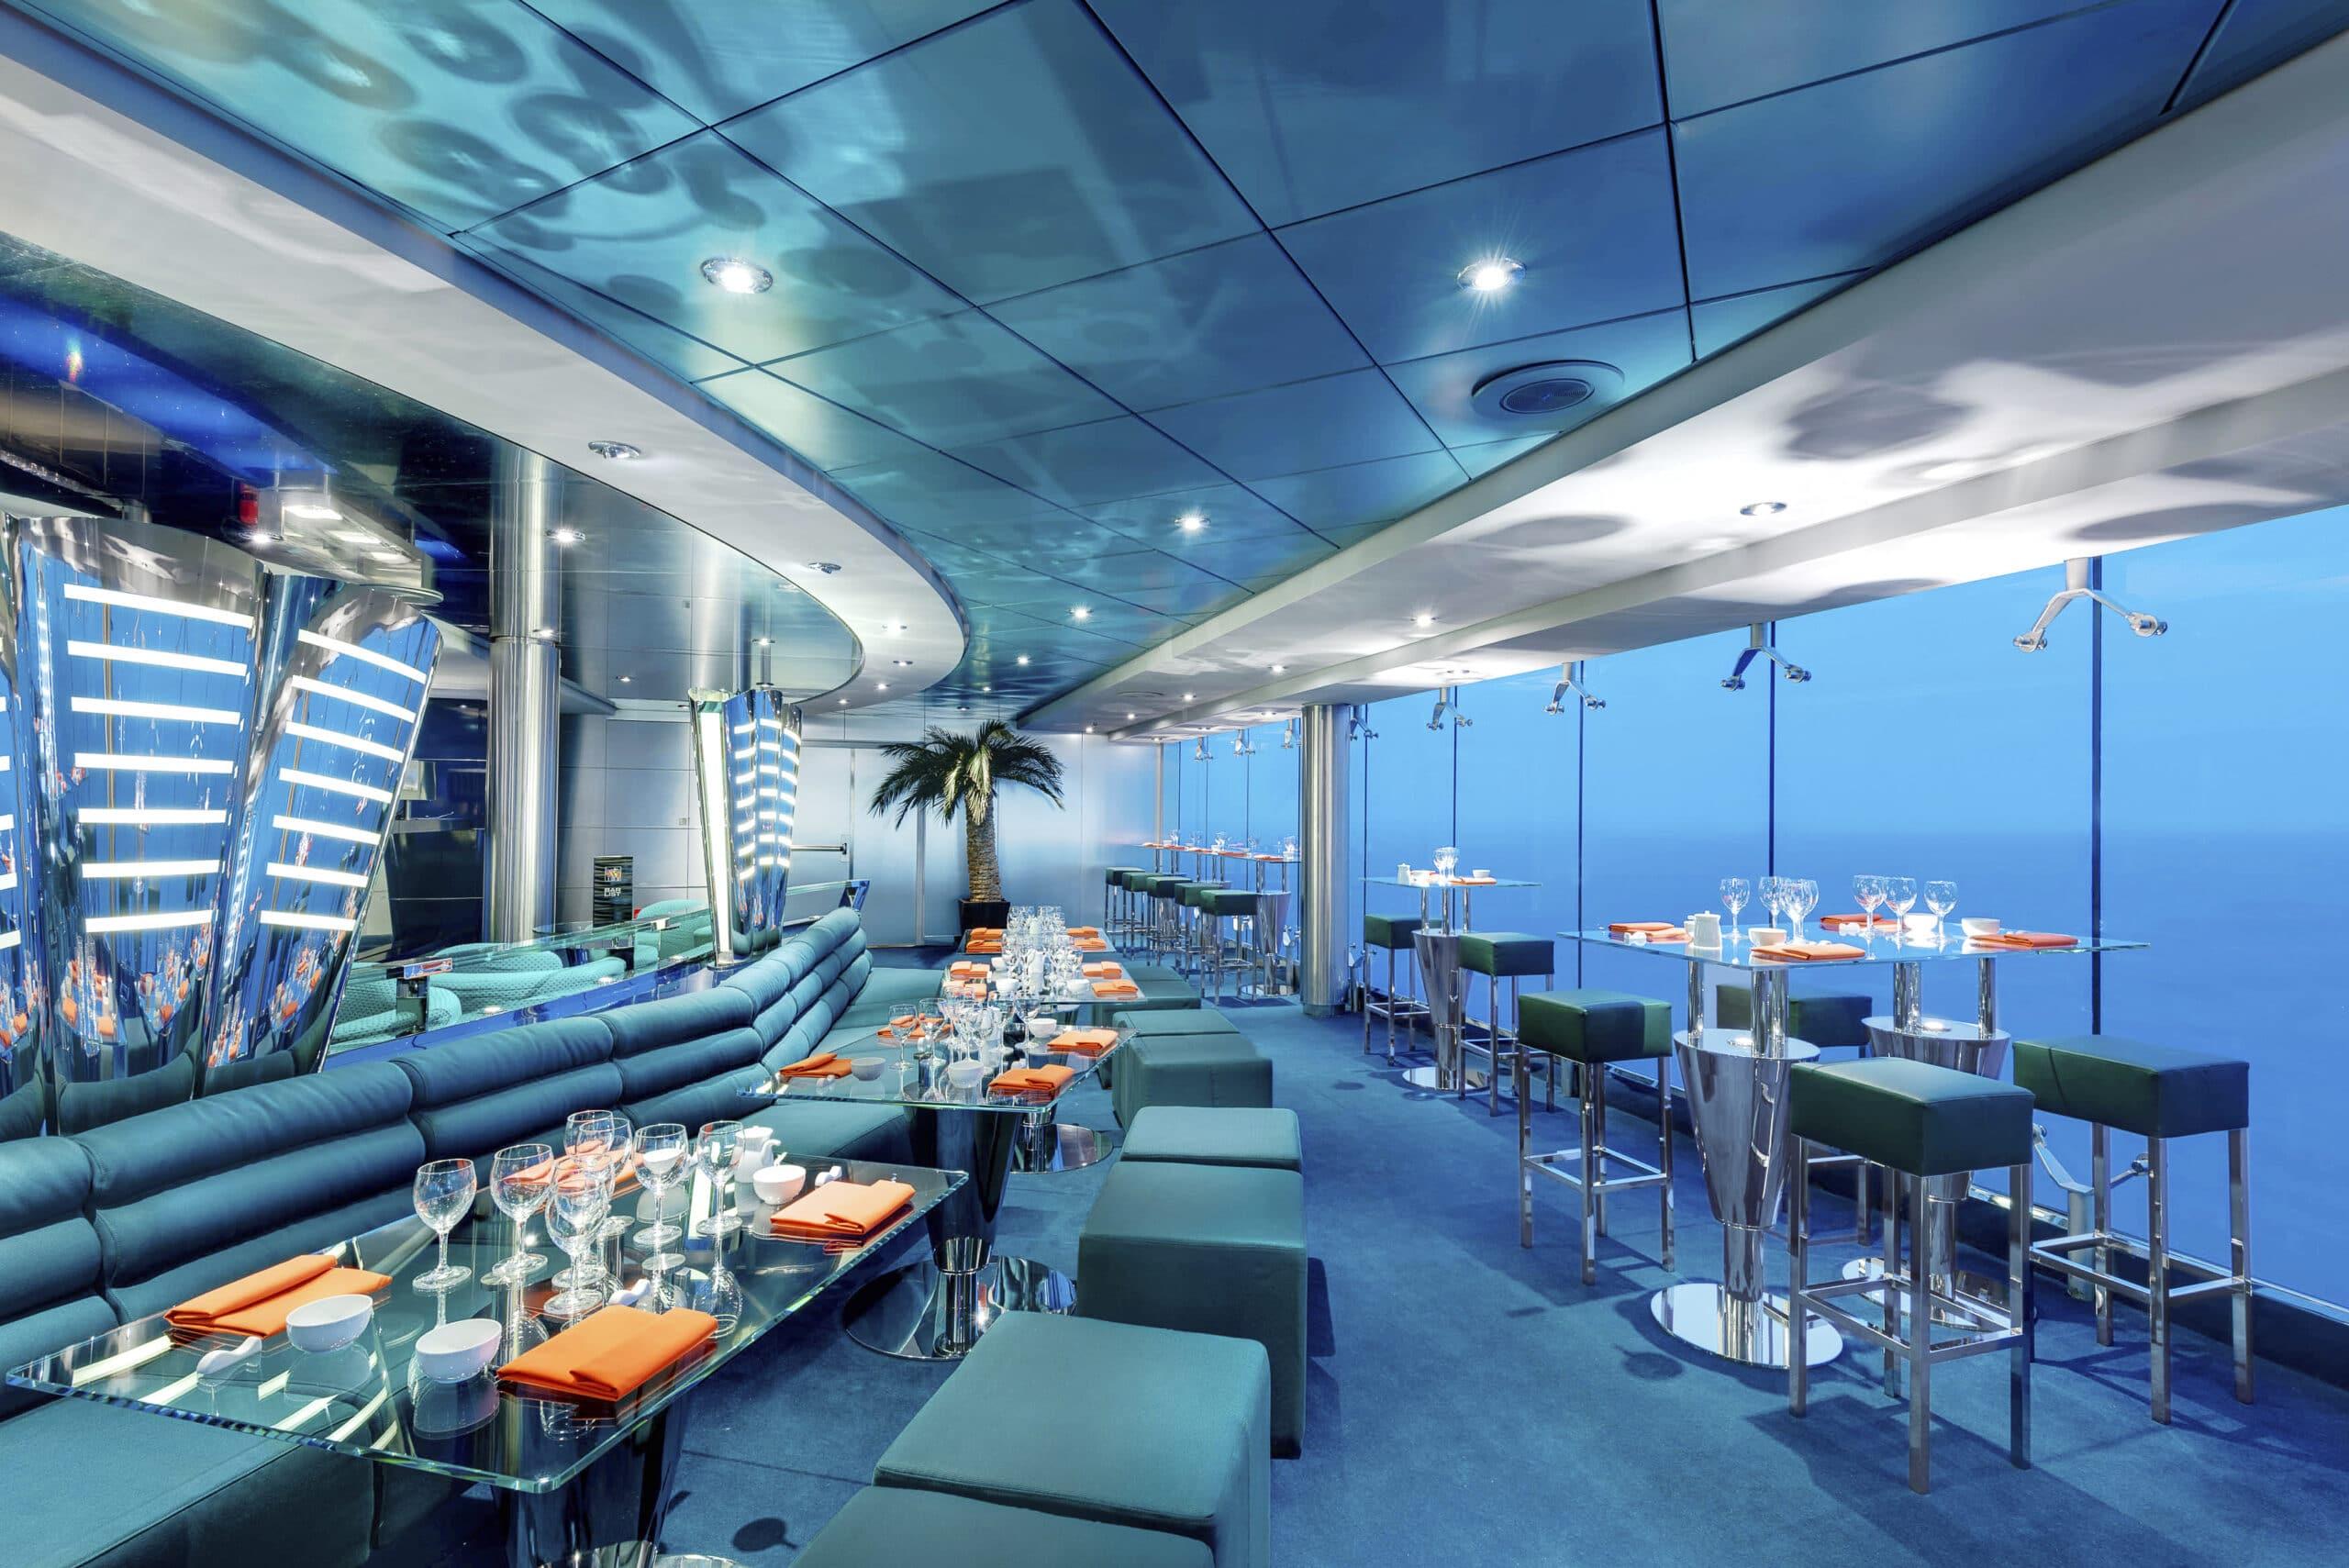 Cruiseschip-MSC Lirica-MSC Cruises-Sushi Bar